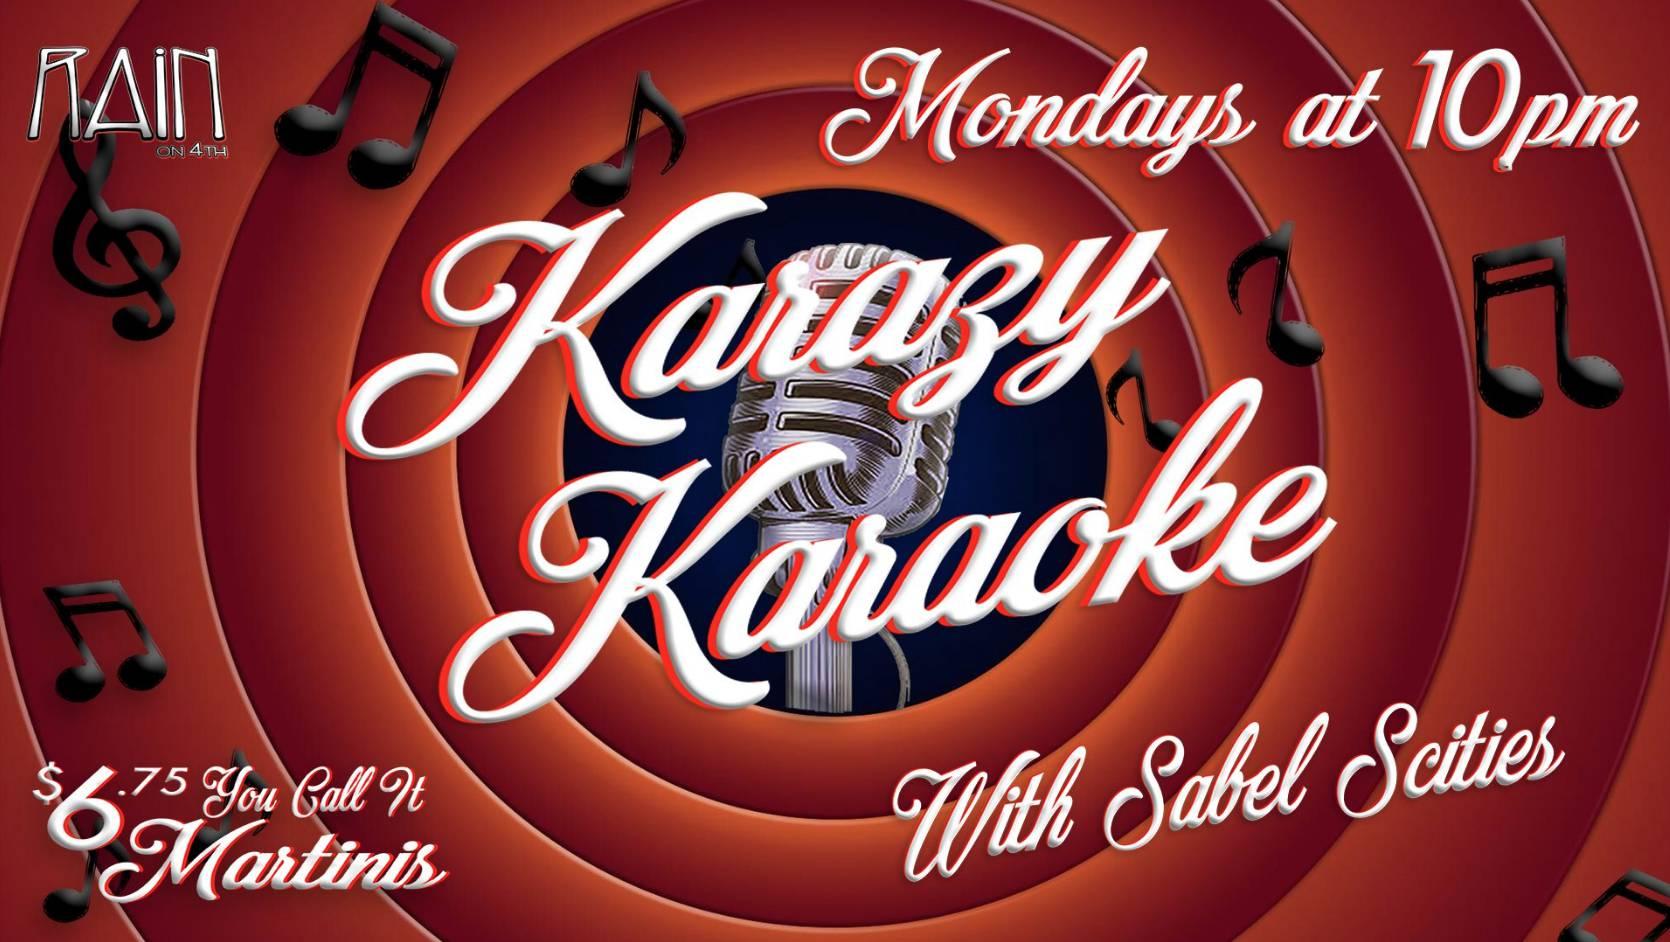 Karazy Karaoke with Sabel Scities